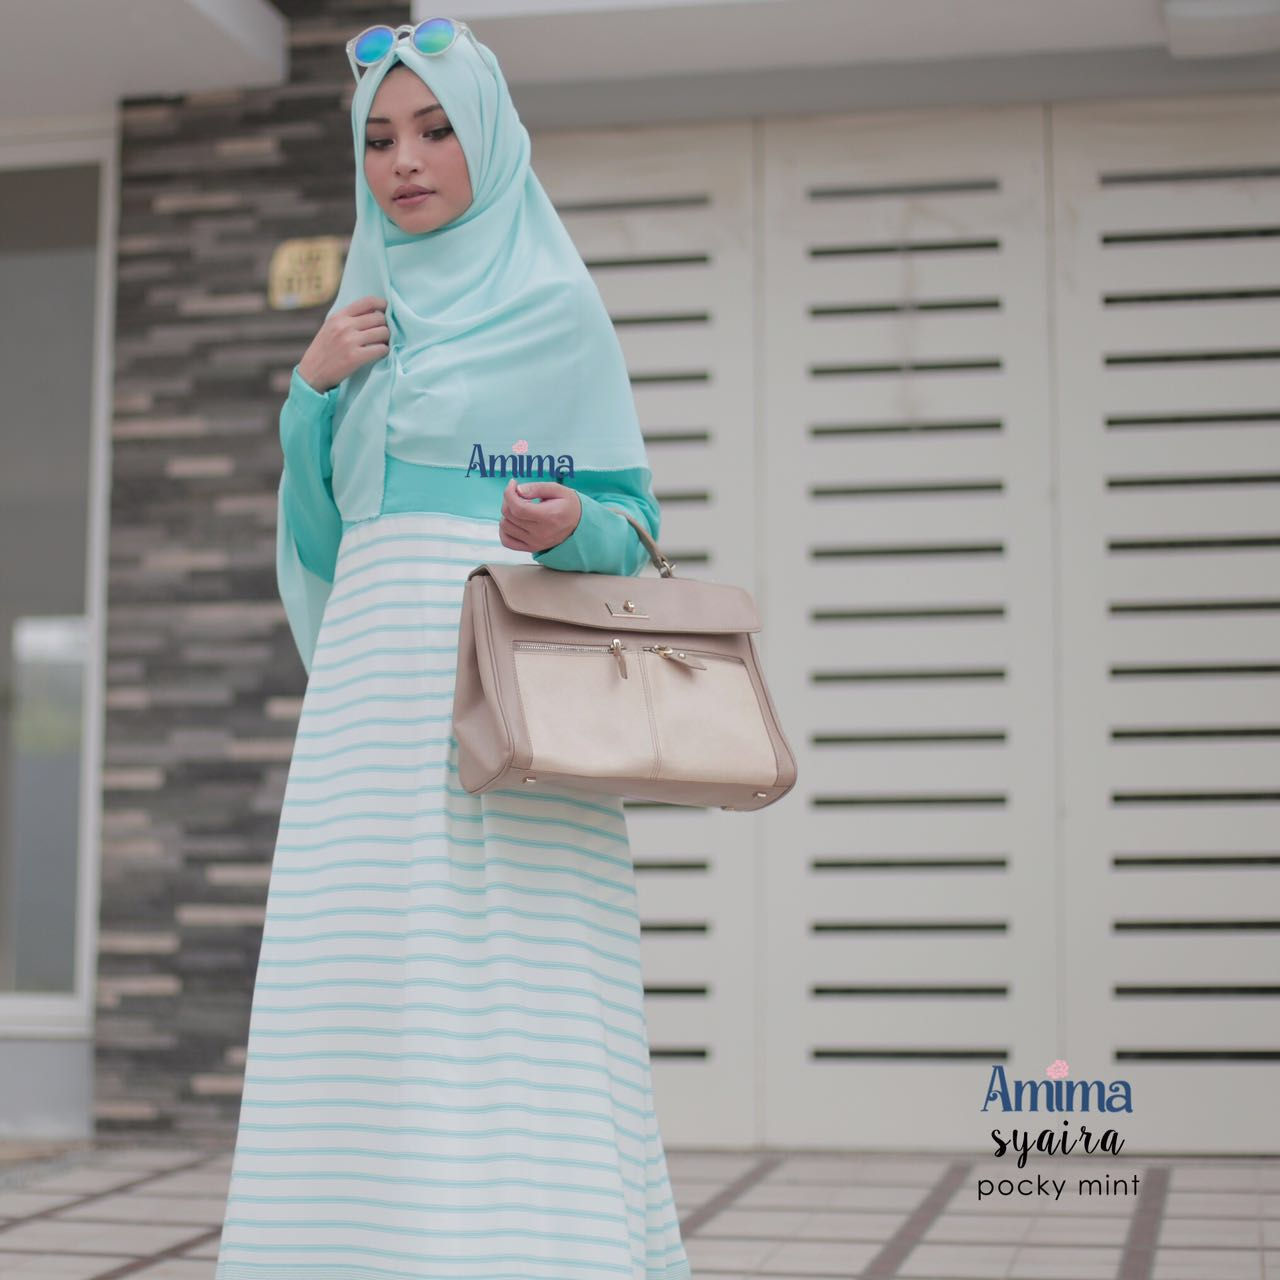 Jual Gamis Amima Syaira Dress Pocky Mint Baju Muslim